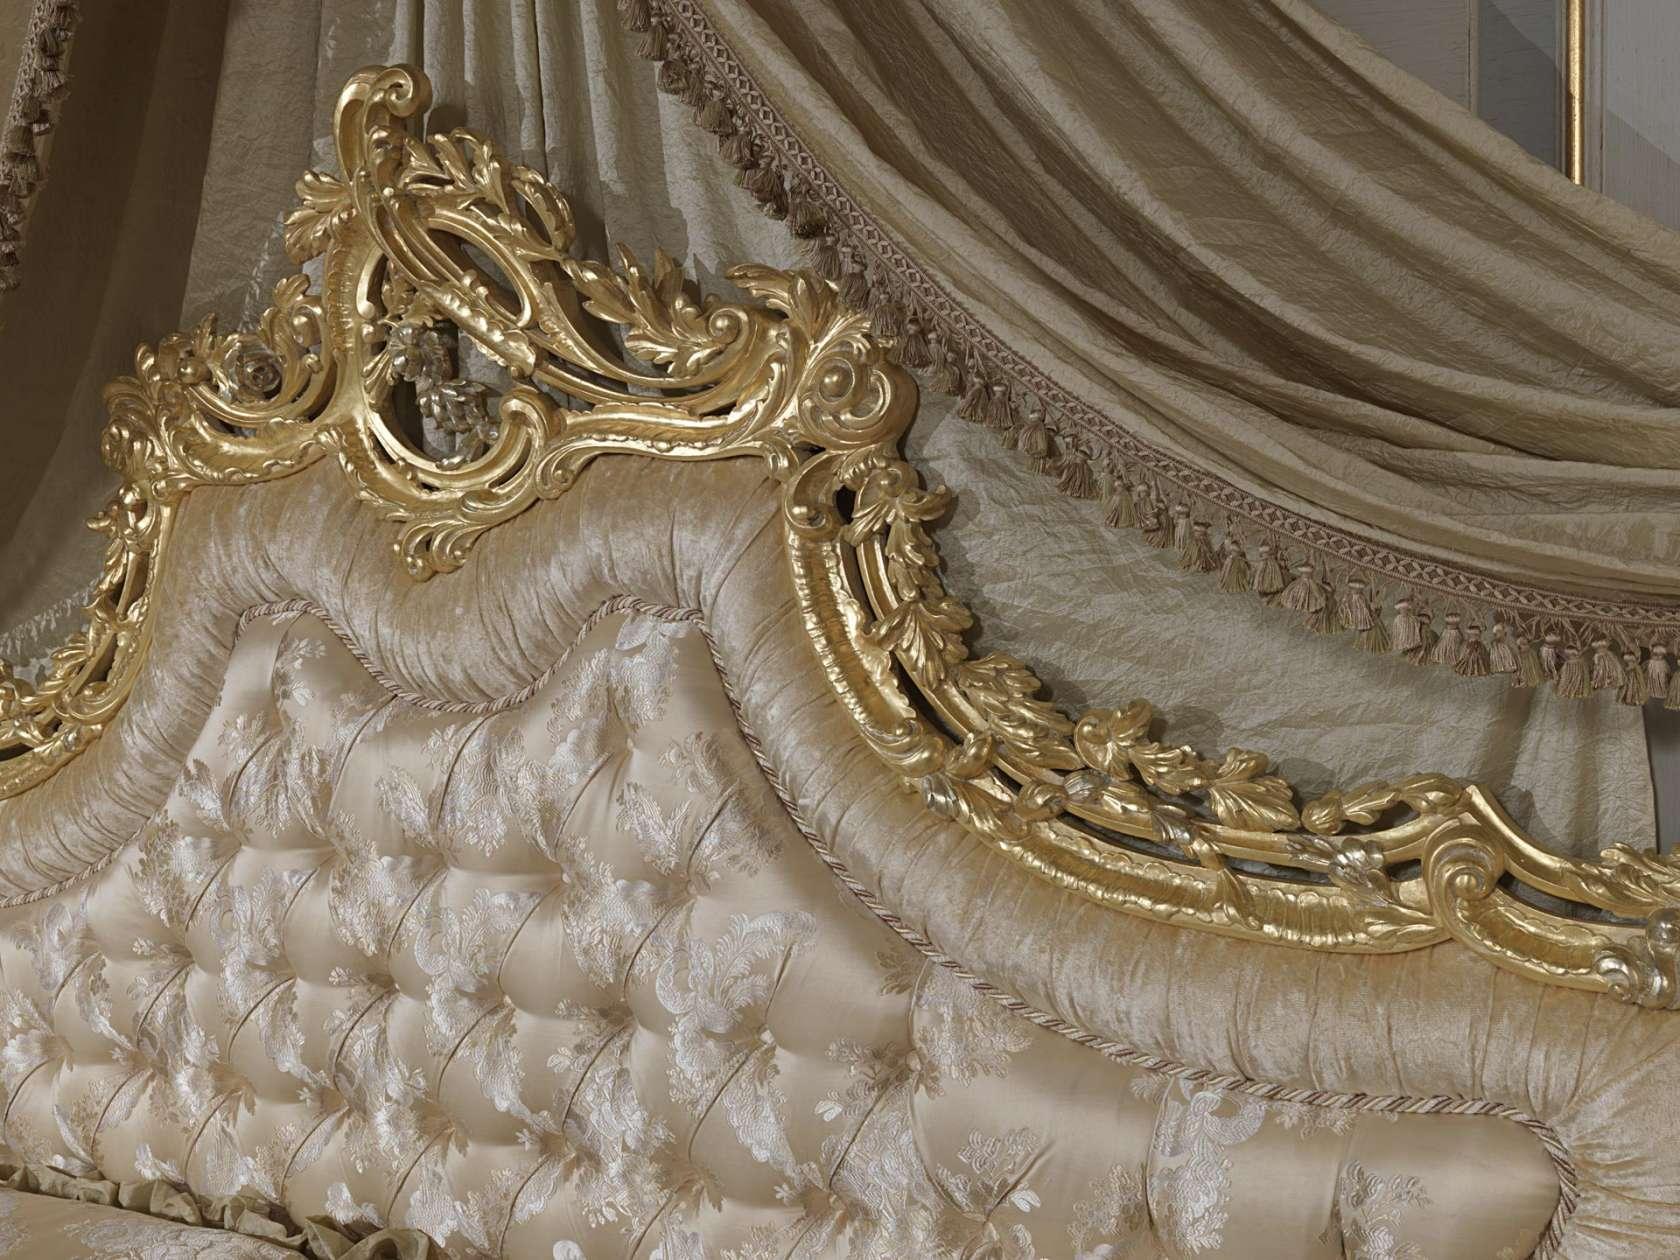 T te de lit baroque 2012 vimercati classic furniture - Tete de lit baroque ...